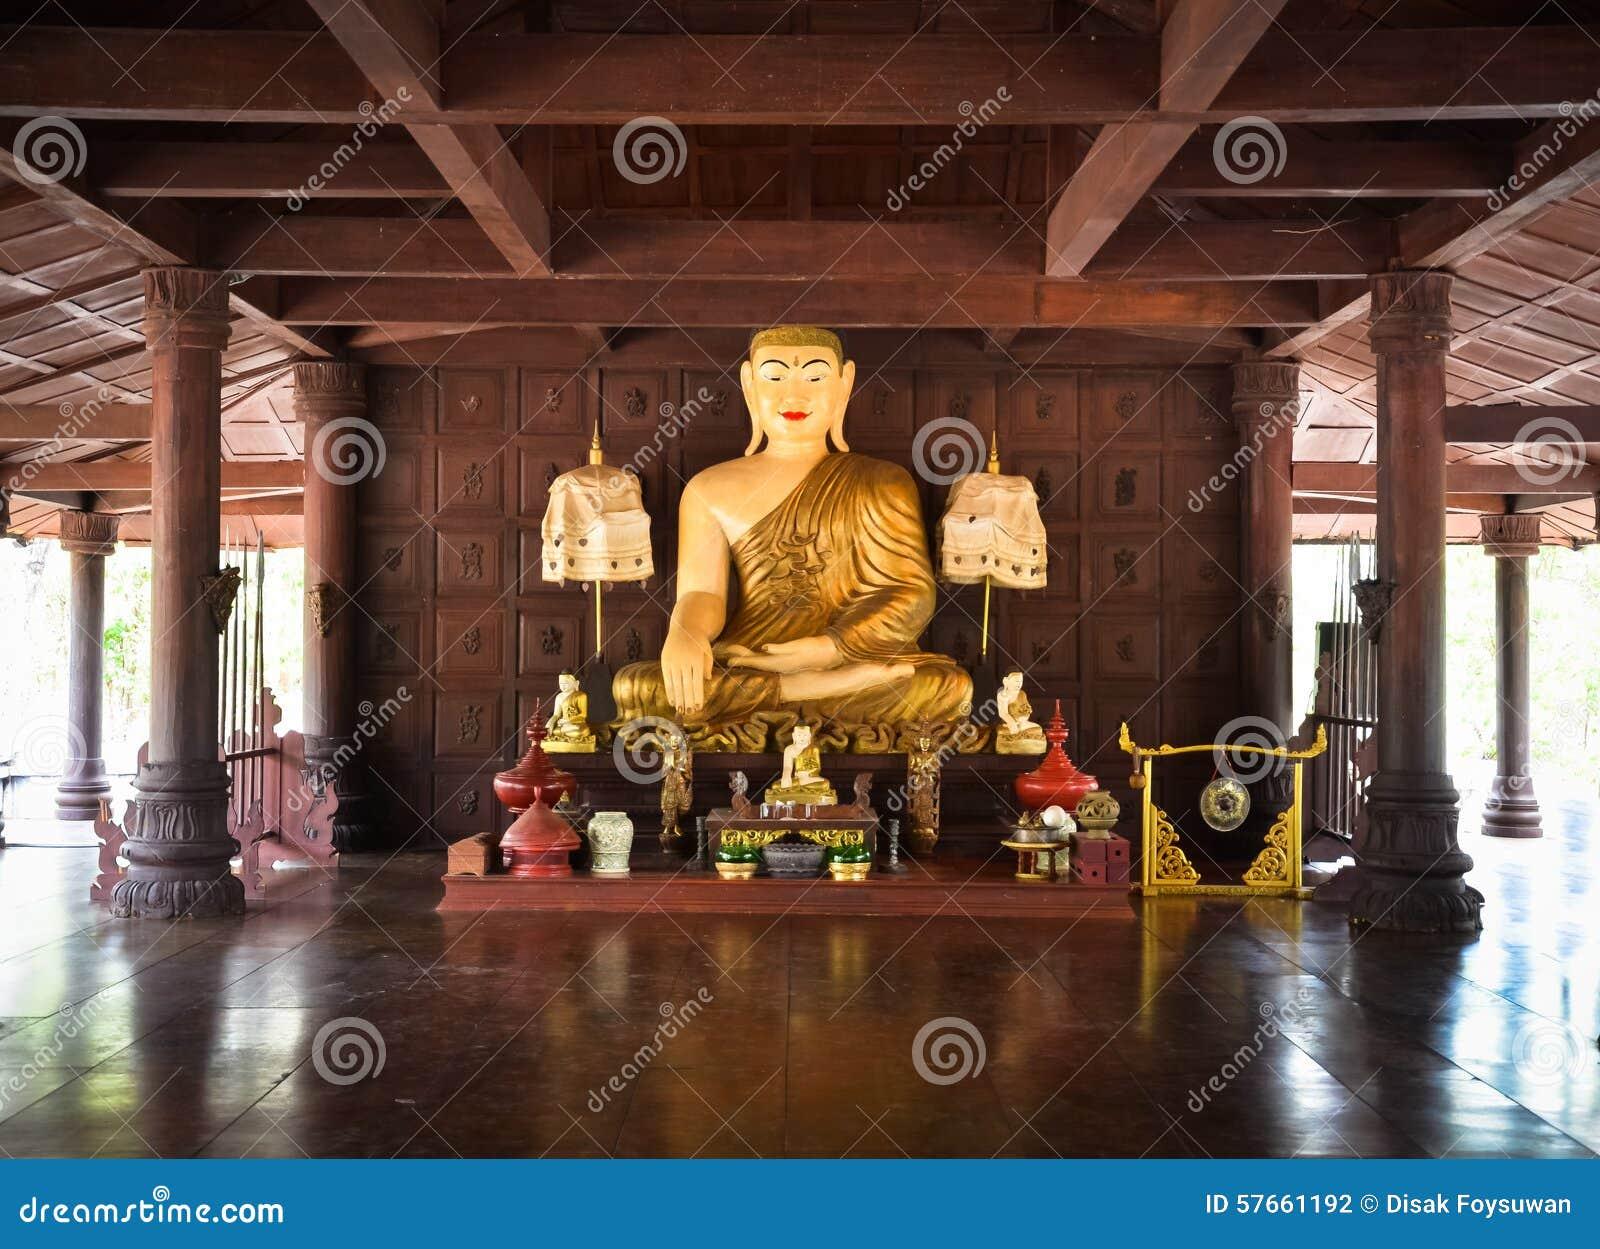 Buddha diagram sitting